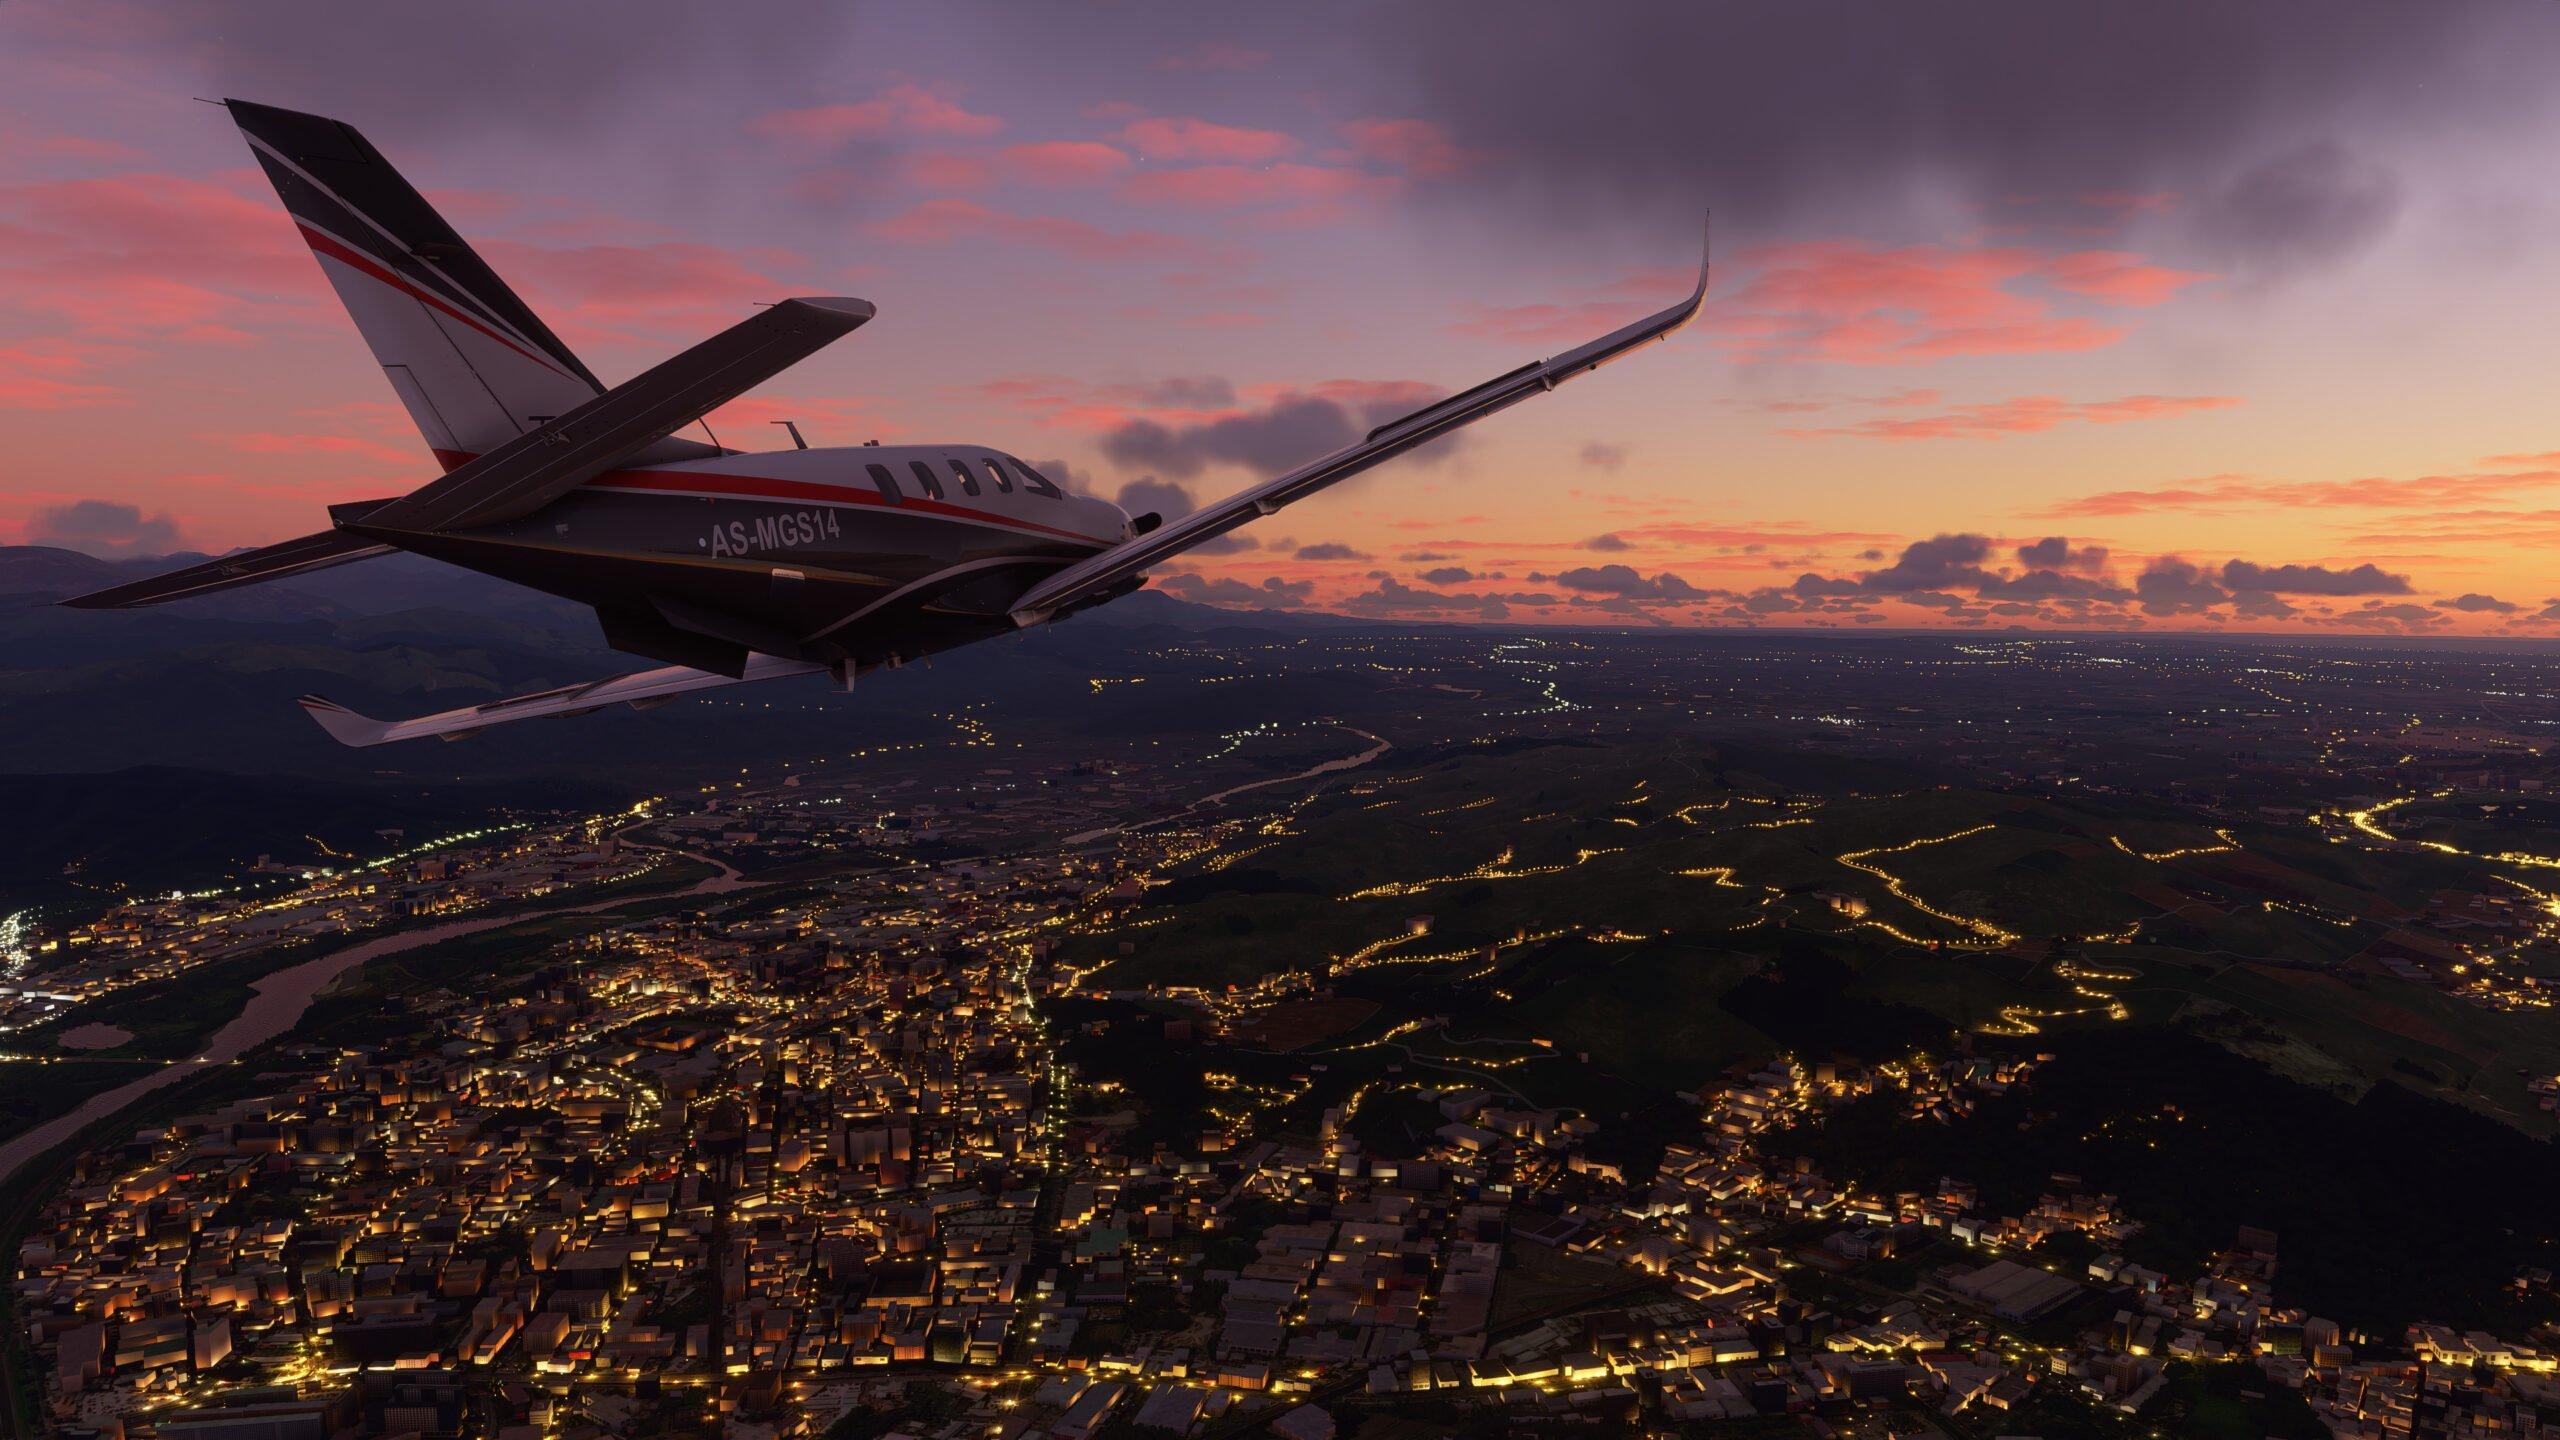 Microsoft Flight Simulator 2020 Wallpaper Packages ...